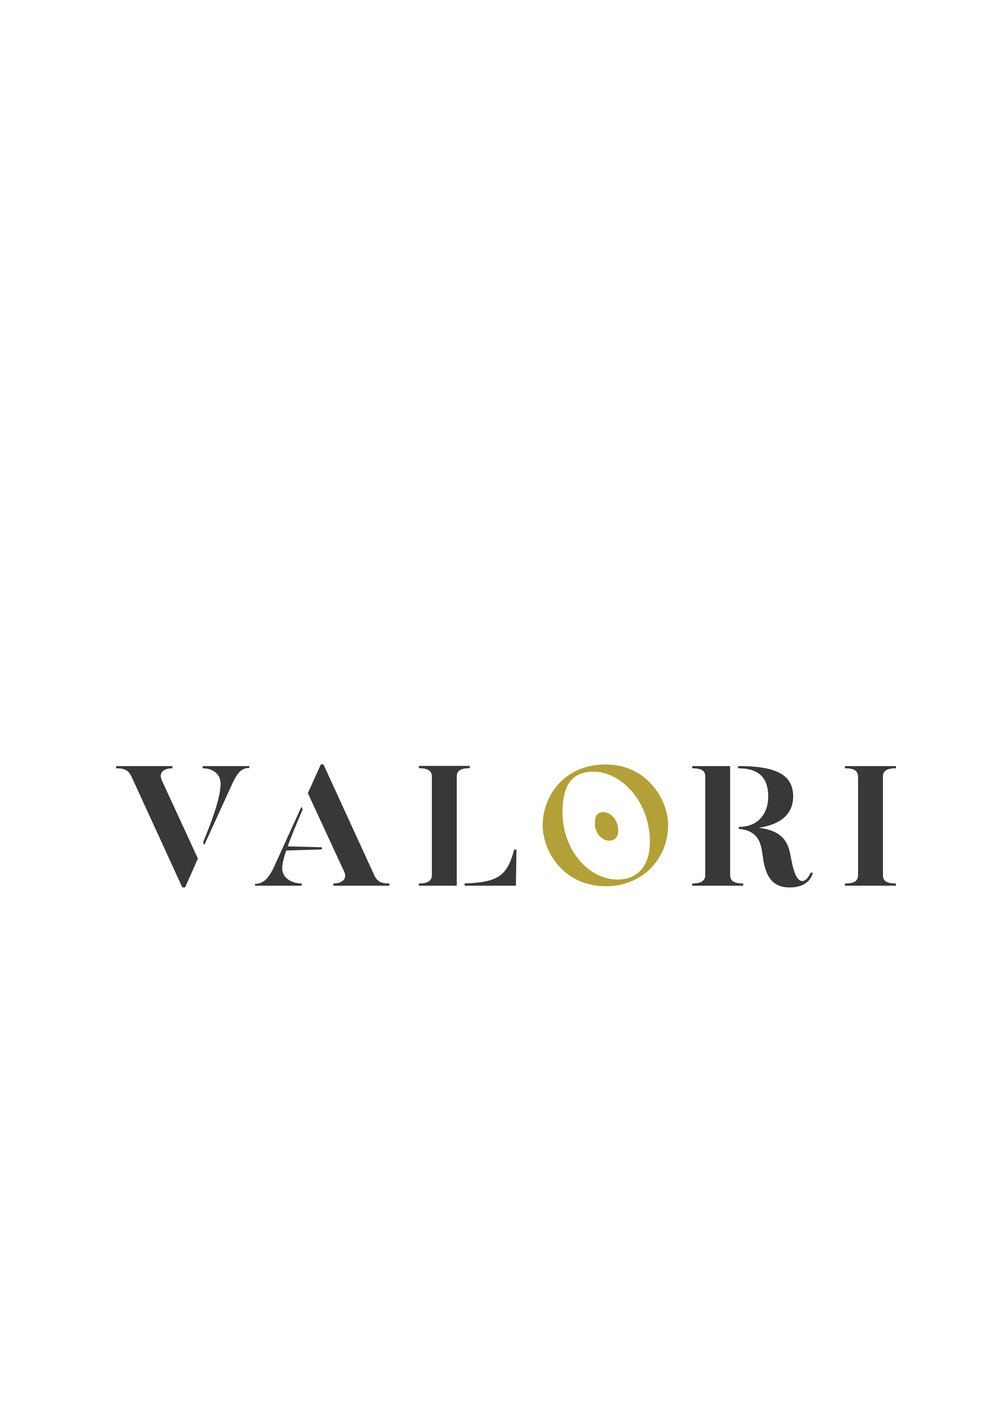 LOGO_VALORI new-01.jpg